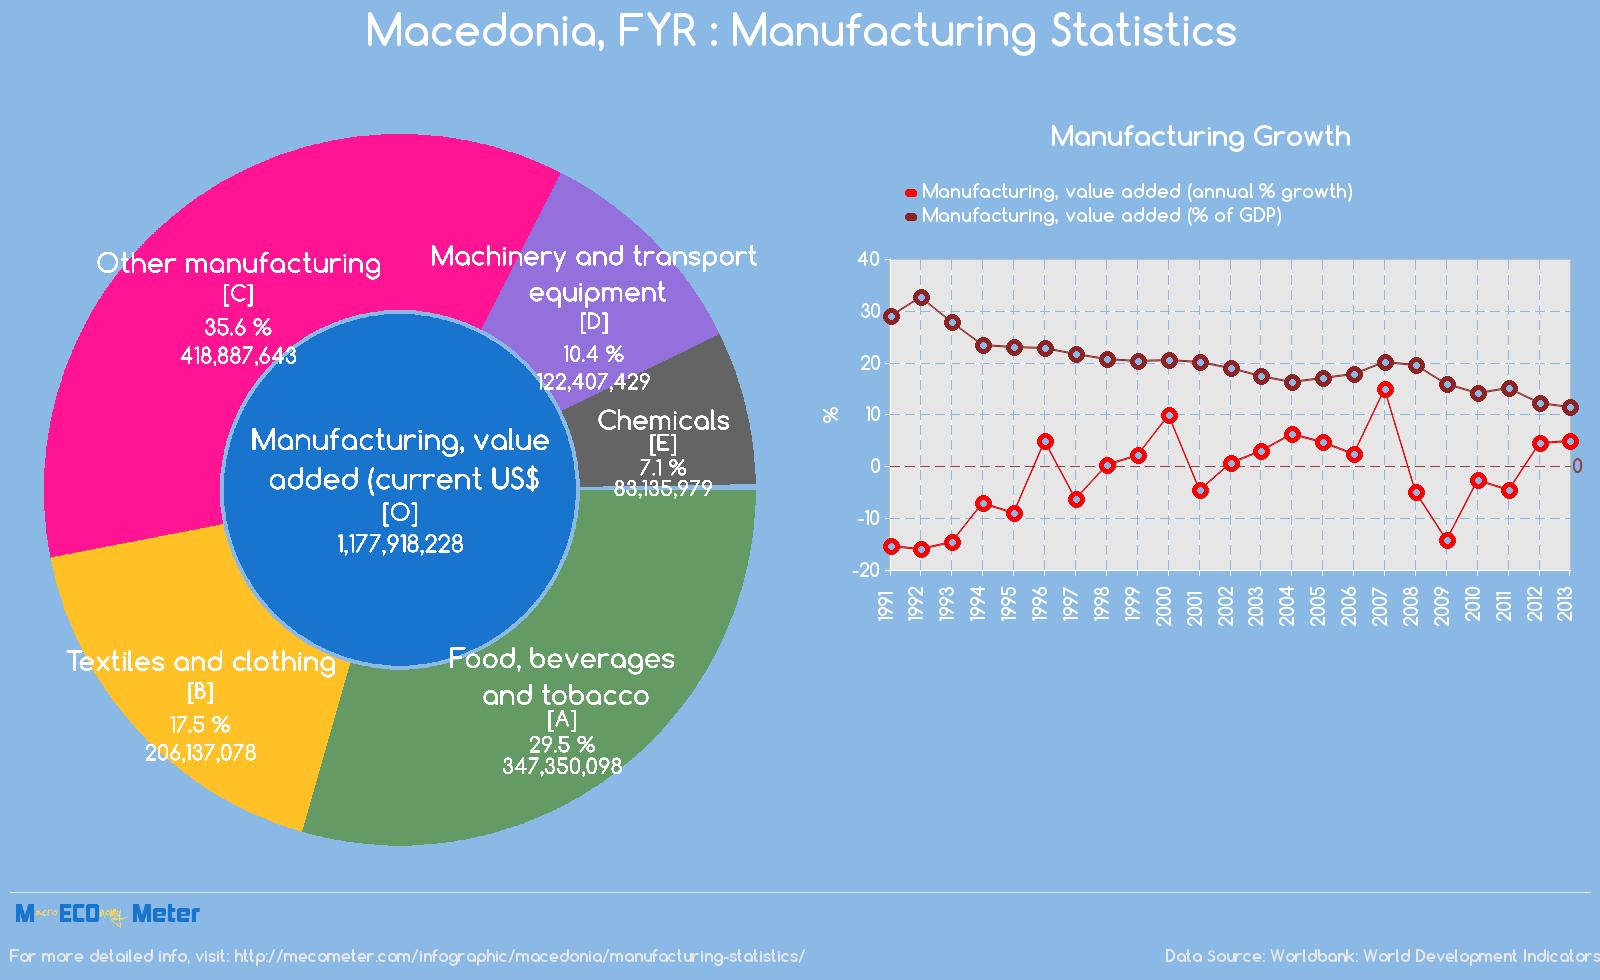 Macedonia, FYR : Manufacturing Statistics